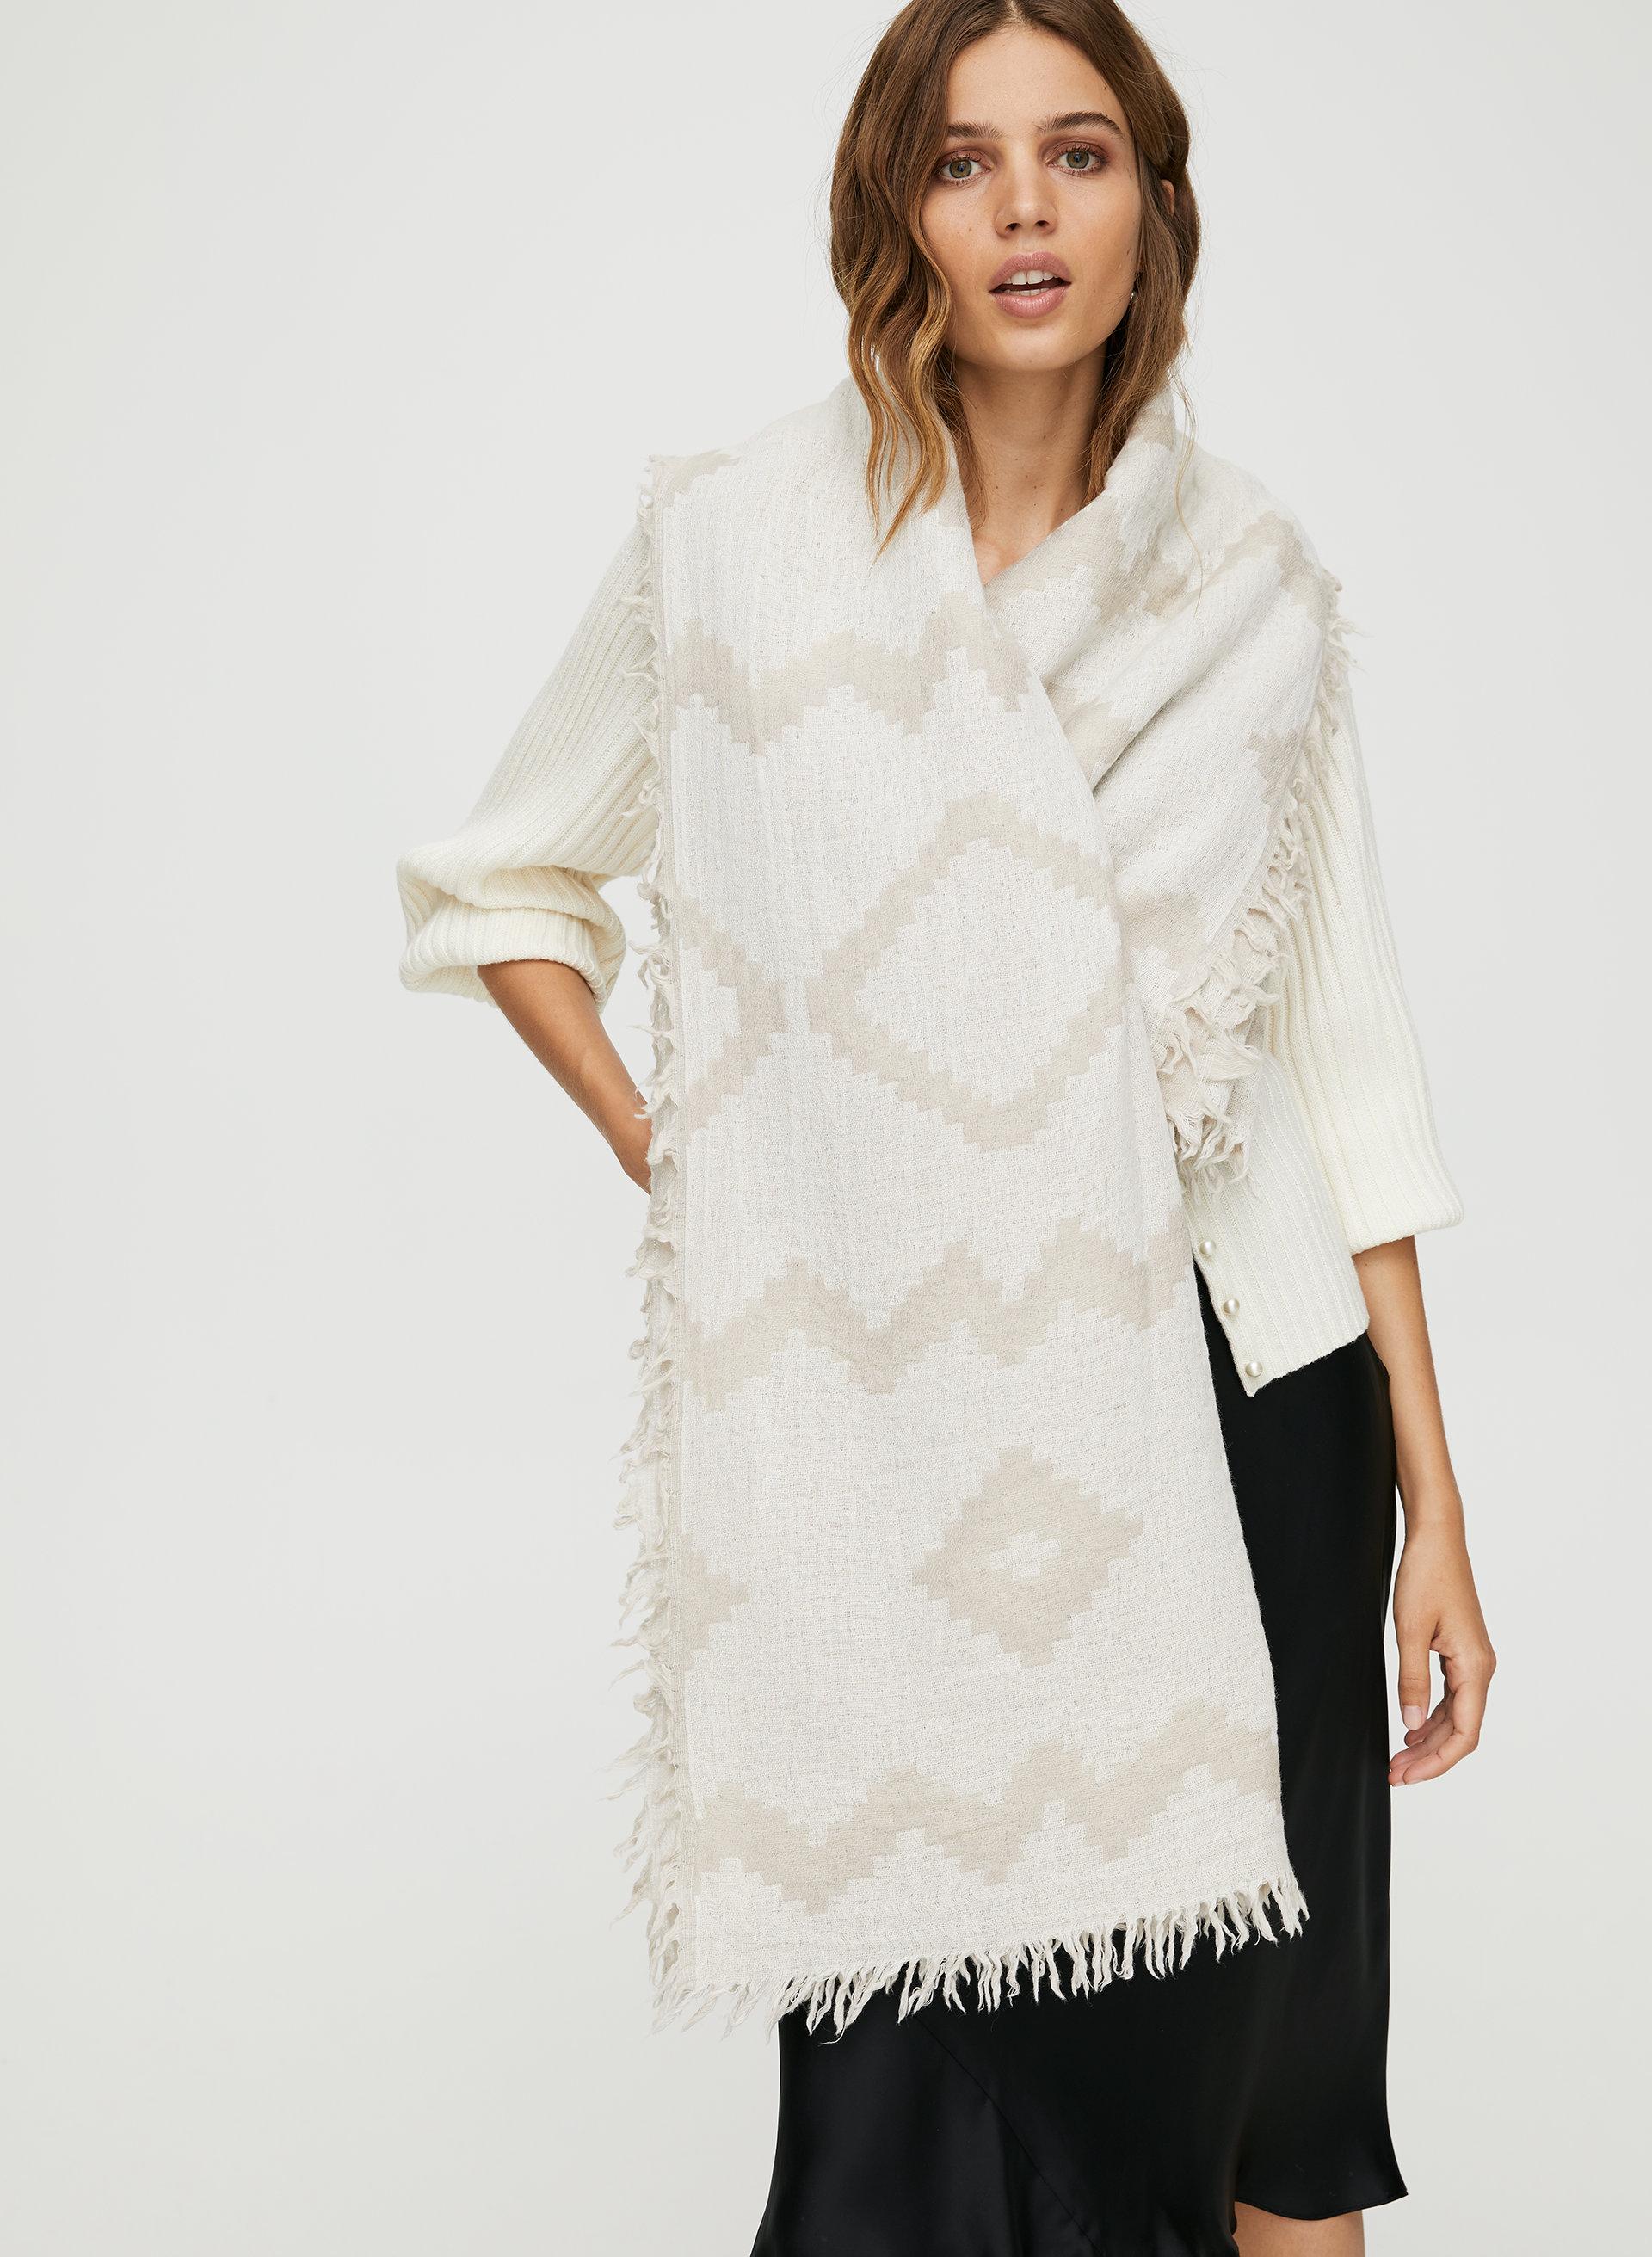 6d7b064e3f484 DIAMOND MOSAIC BLANKET SCARF - Patterned, wool blanket scarf